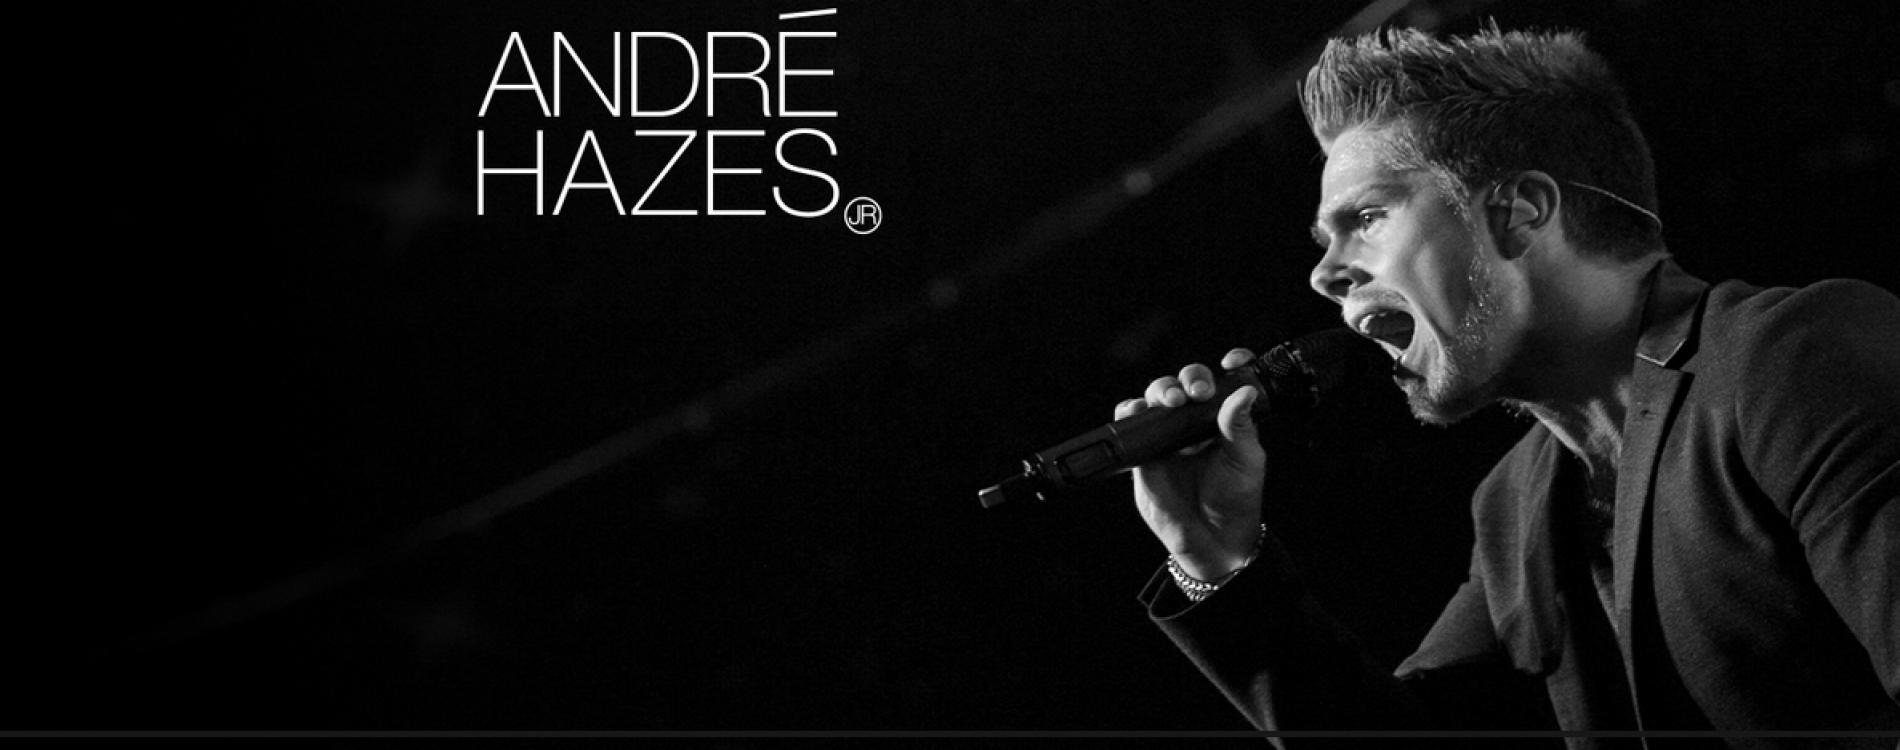 Bekende zanger André Hazes zingend